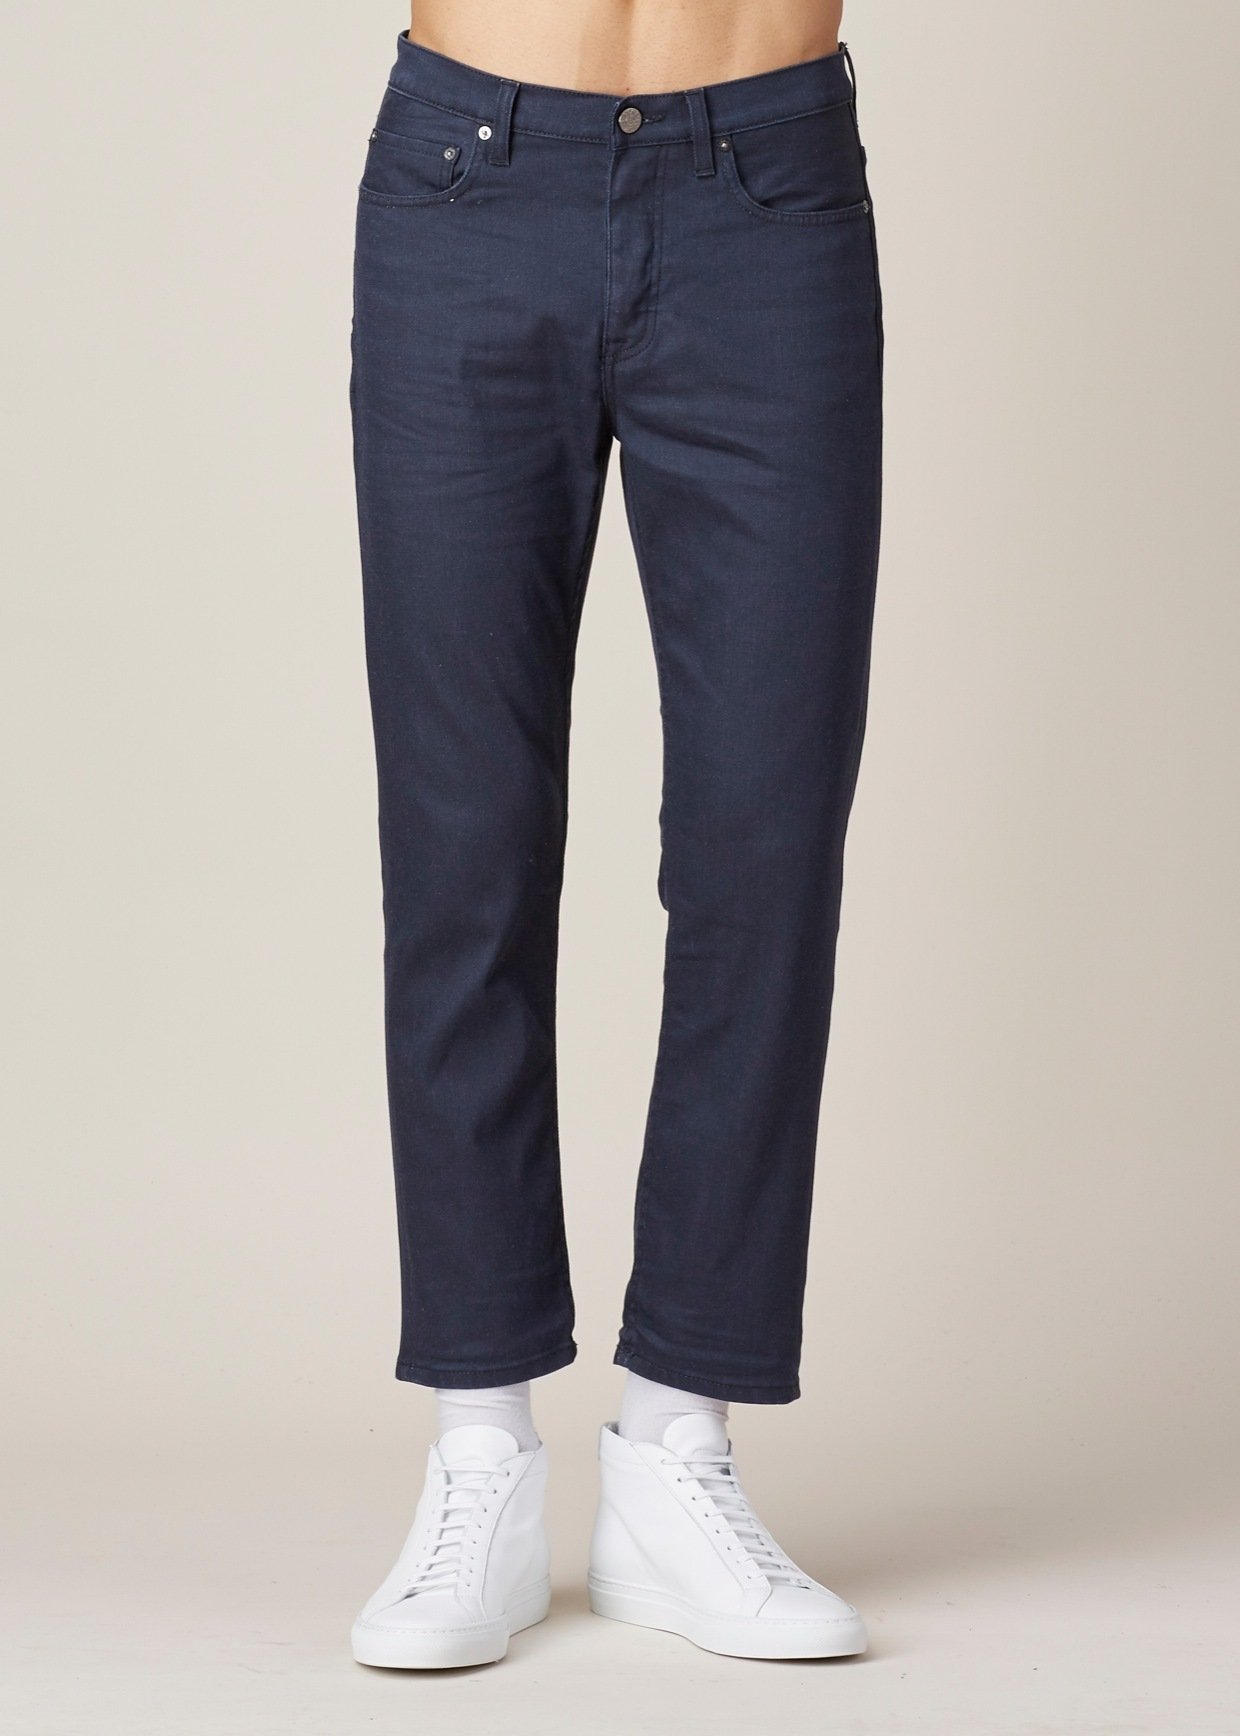 8ae7ee3901d1 Lyst - Acne Studios Moon Town Jean in Blue for Men